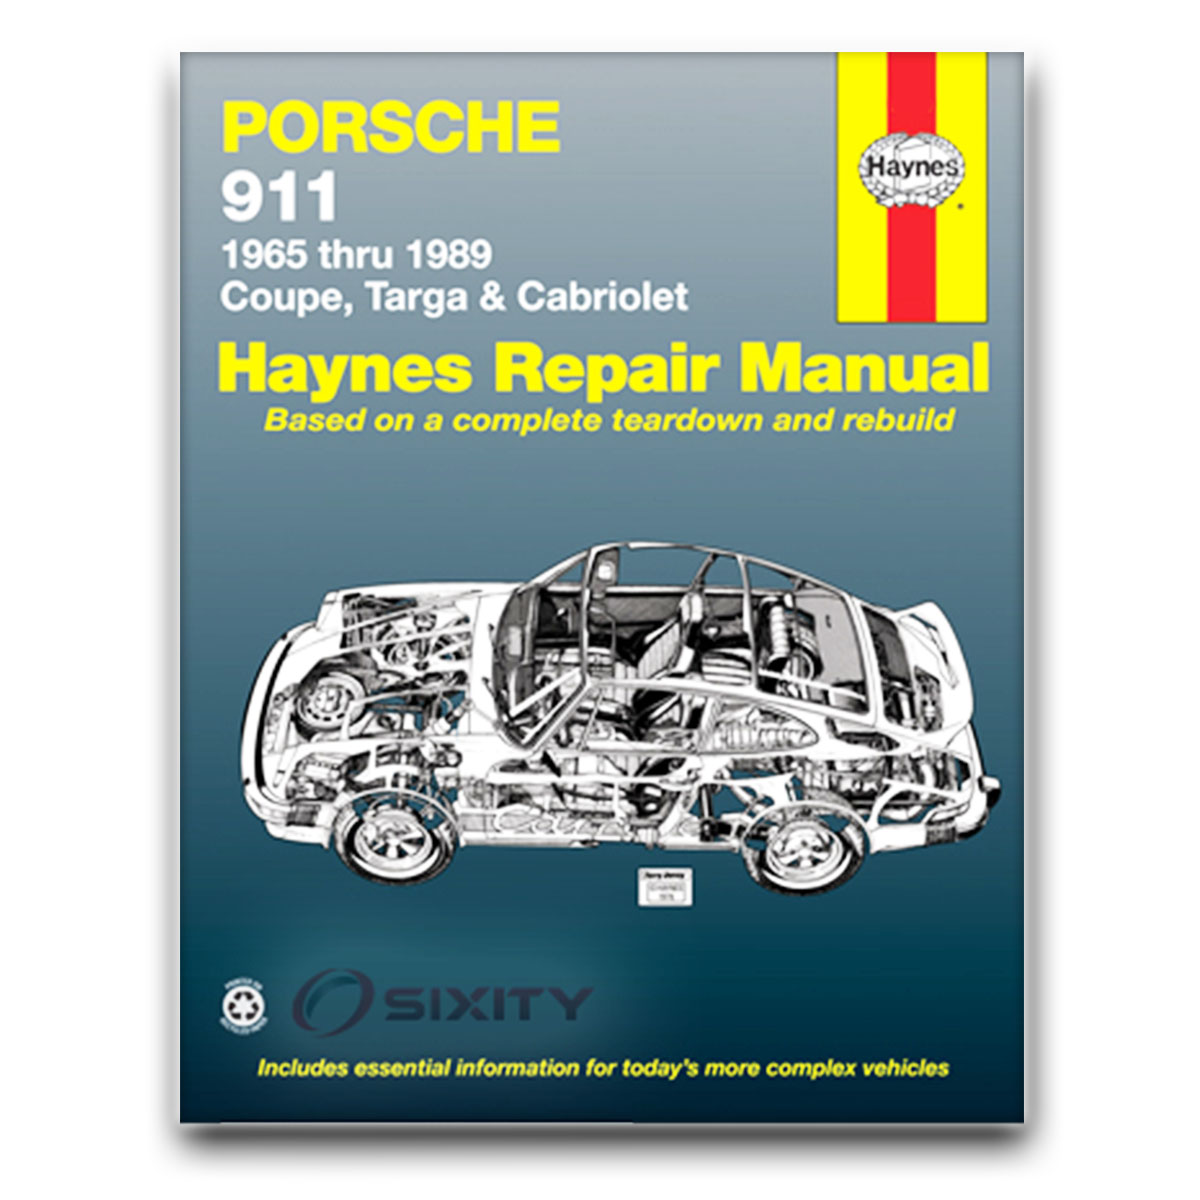 haynes porsche 911 65 89 repair manual 80020 shop service. Black Bedroom Furniture Sets. Home Design Ideas